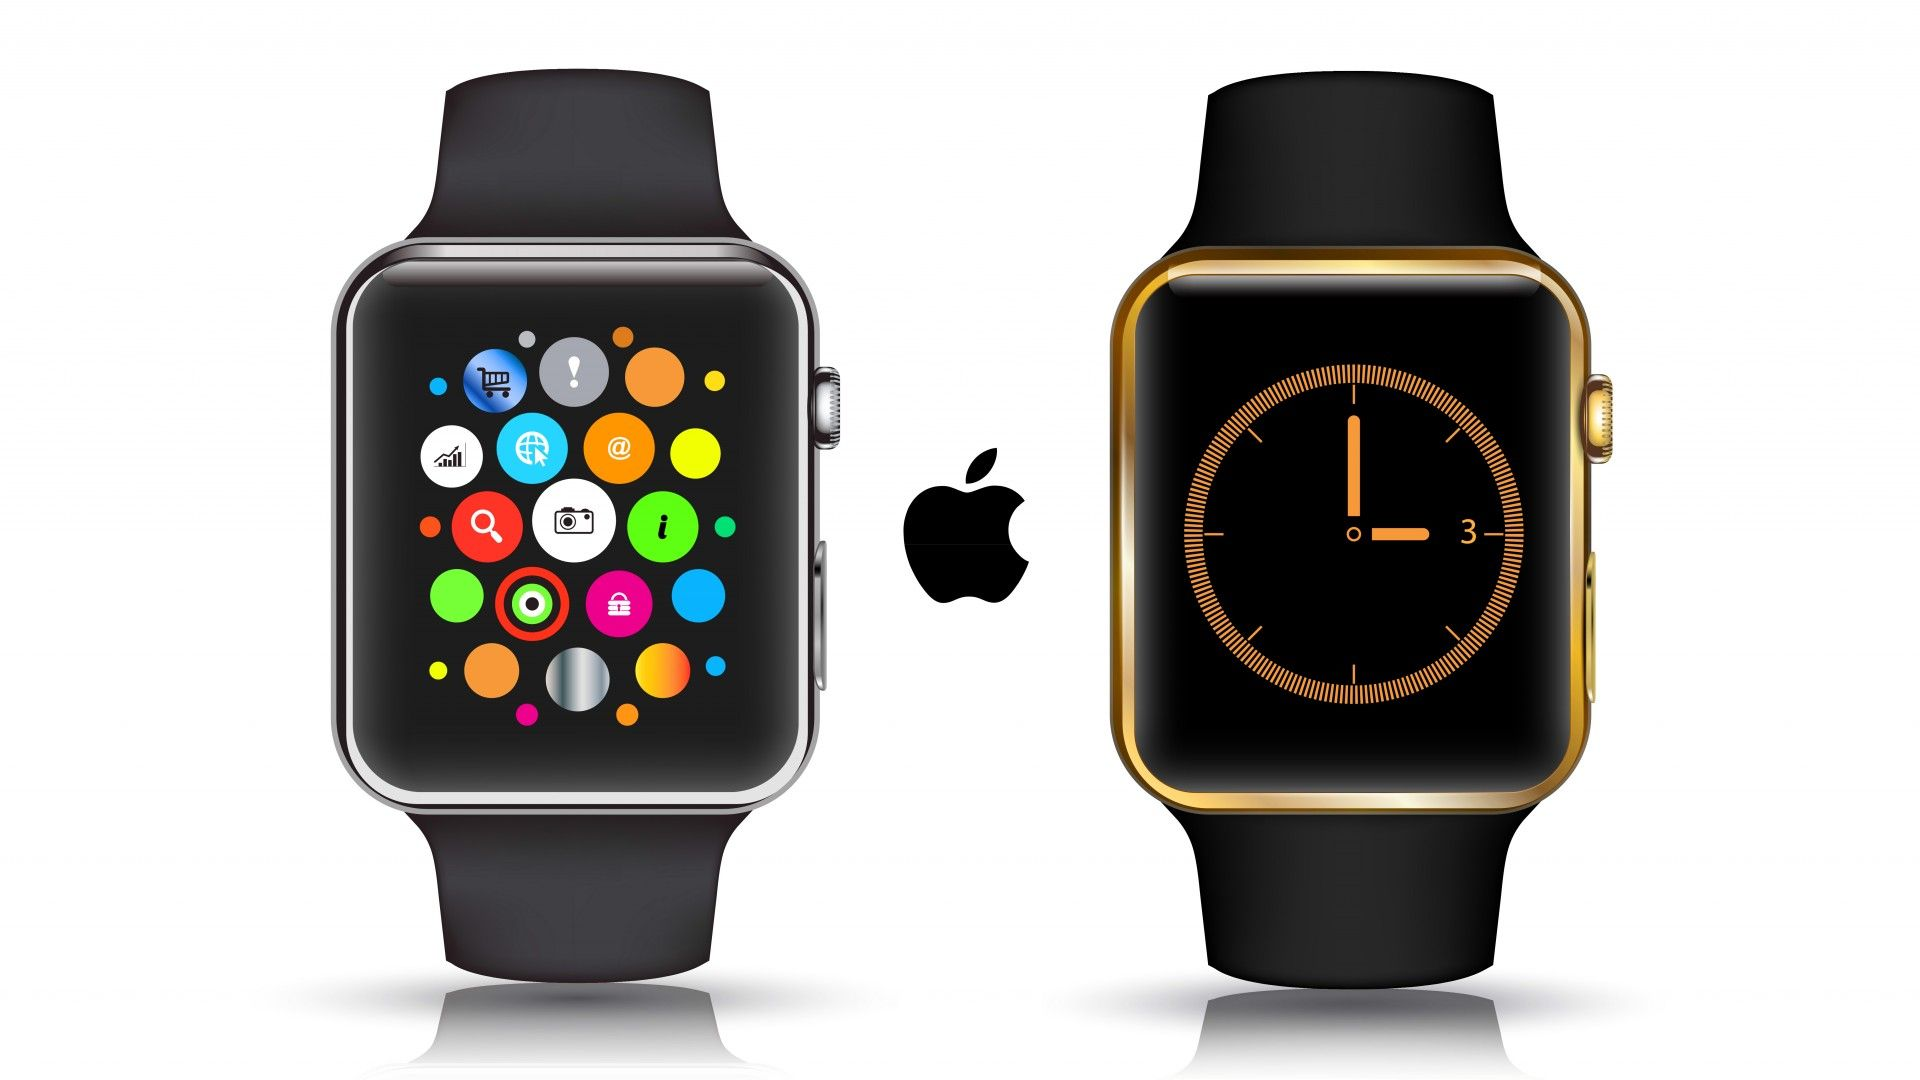 Smartwatch 1080p